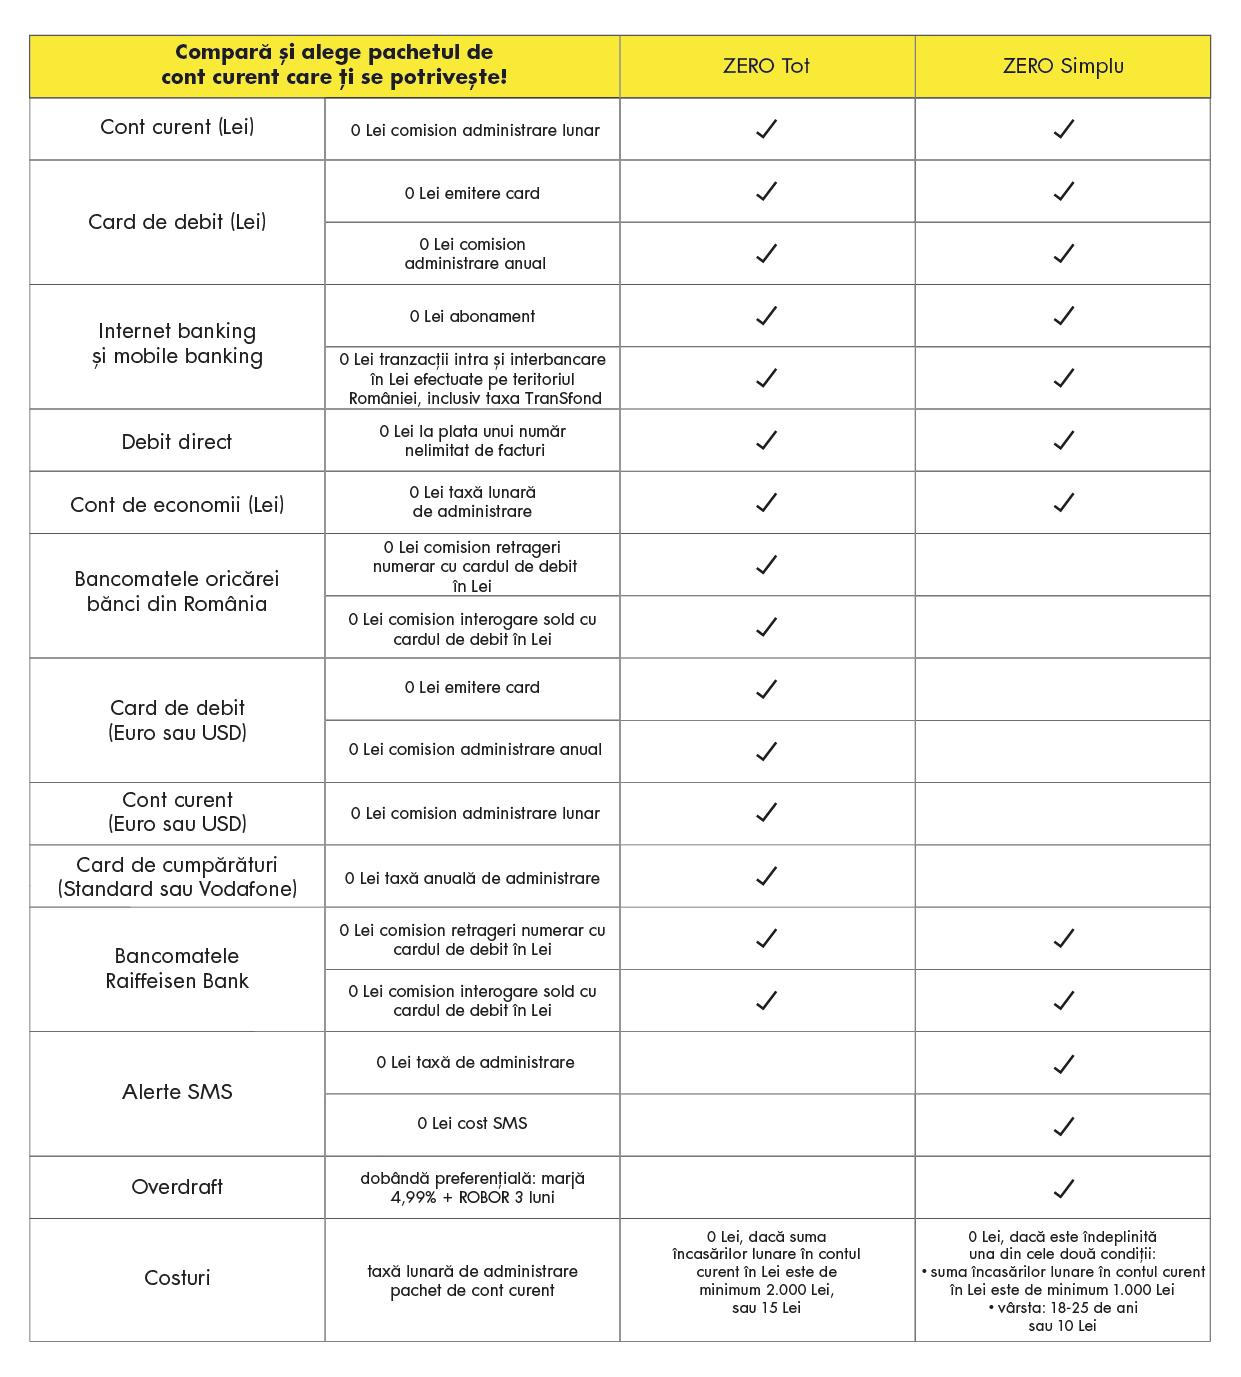 tabel de traducere a viziunii)